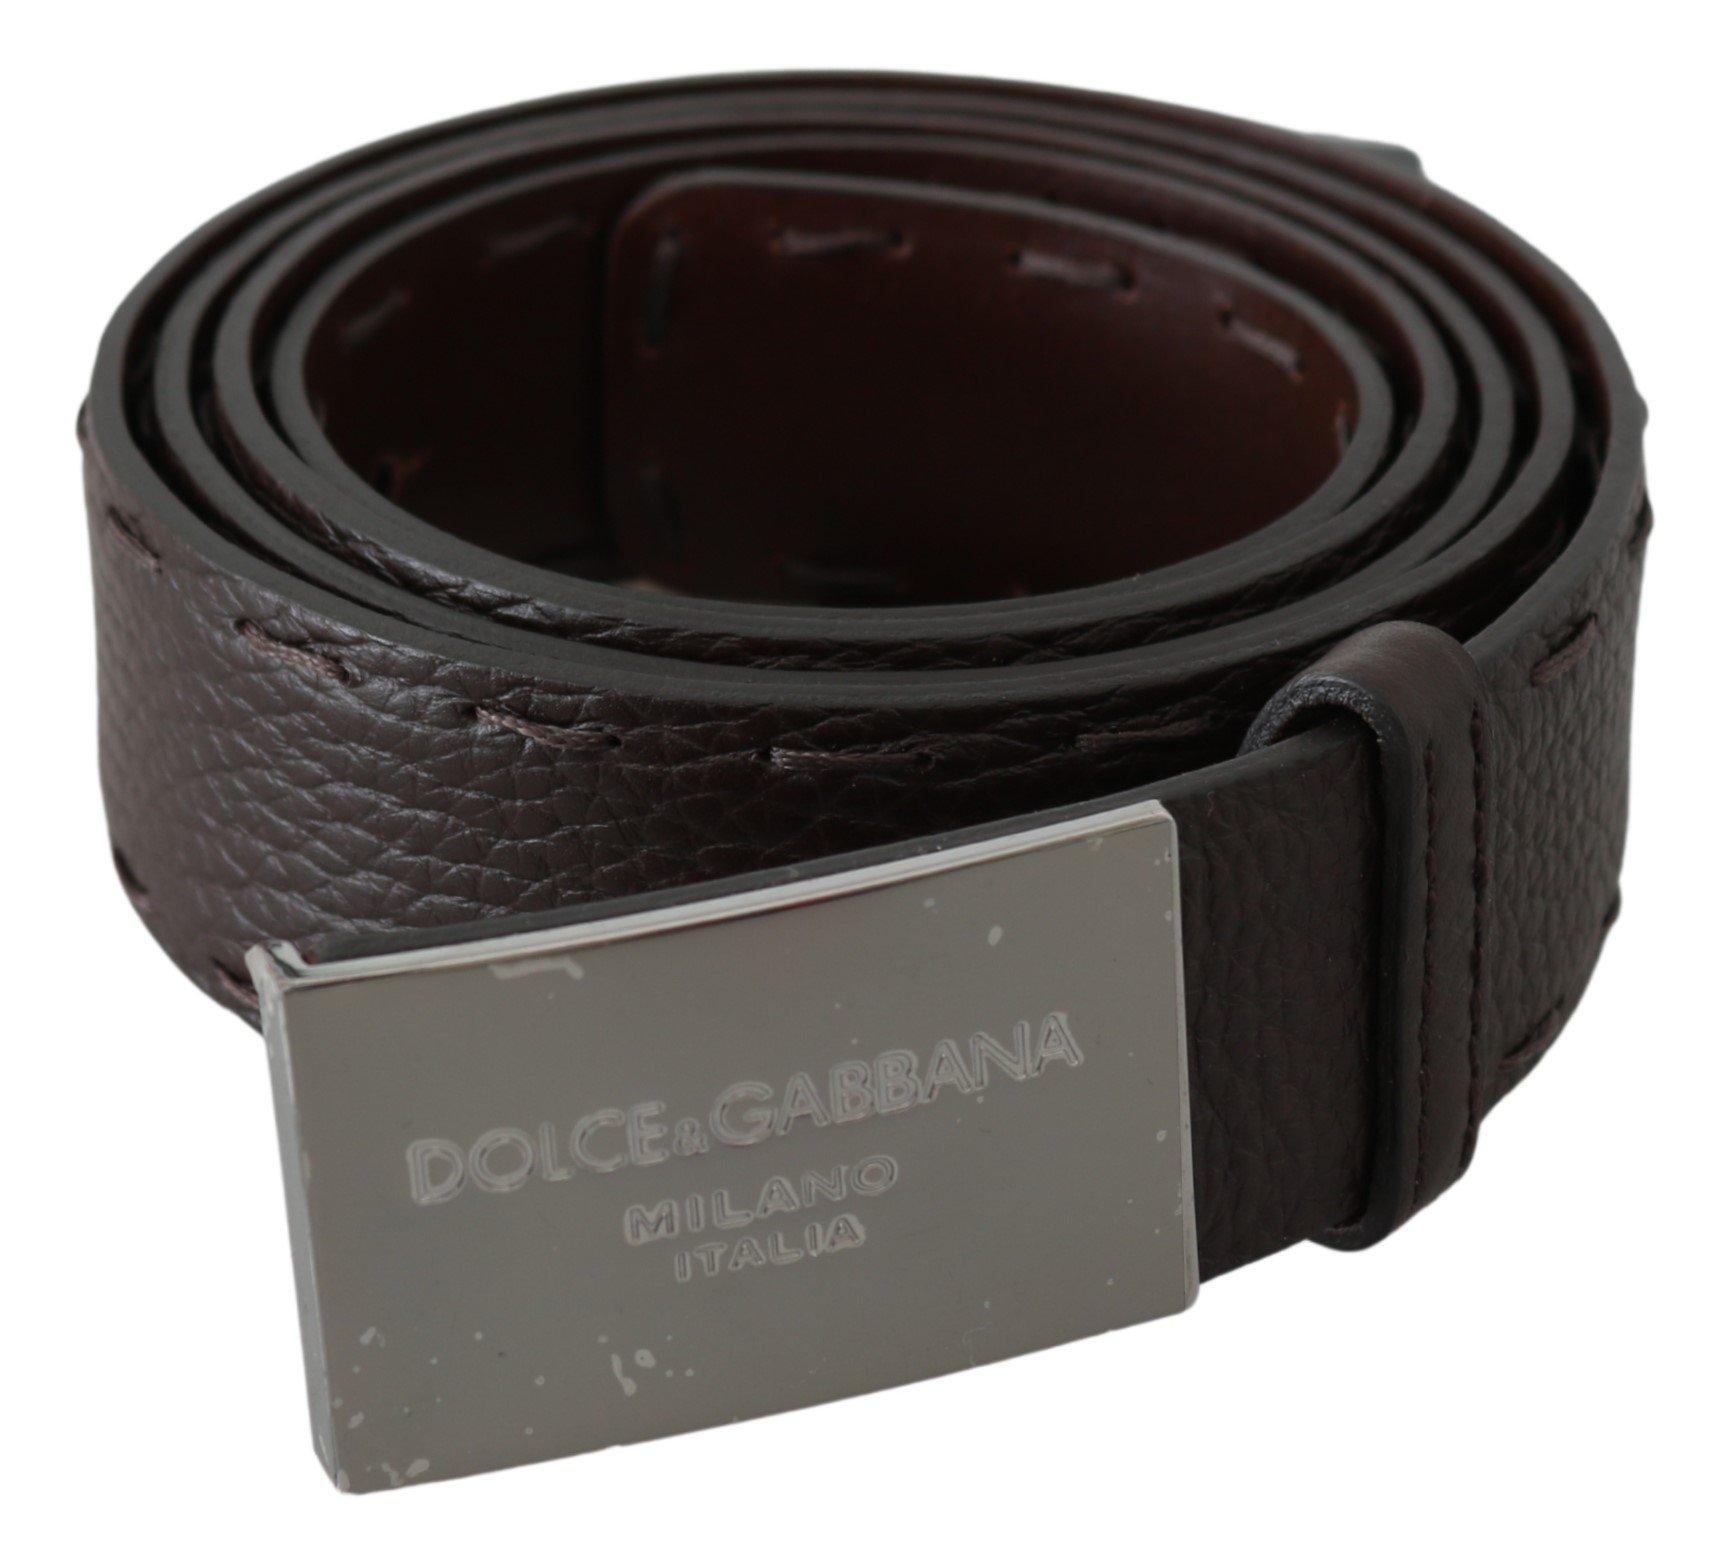 Dolce & Gabbana Men's Pattern Leather DG Logo Buckle Belt Brown BEL60672 - 100 cm / 40 Inches